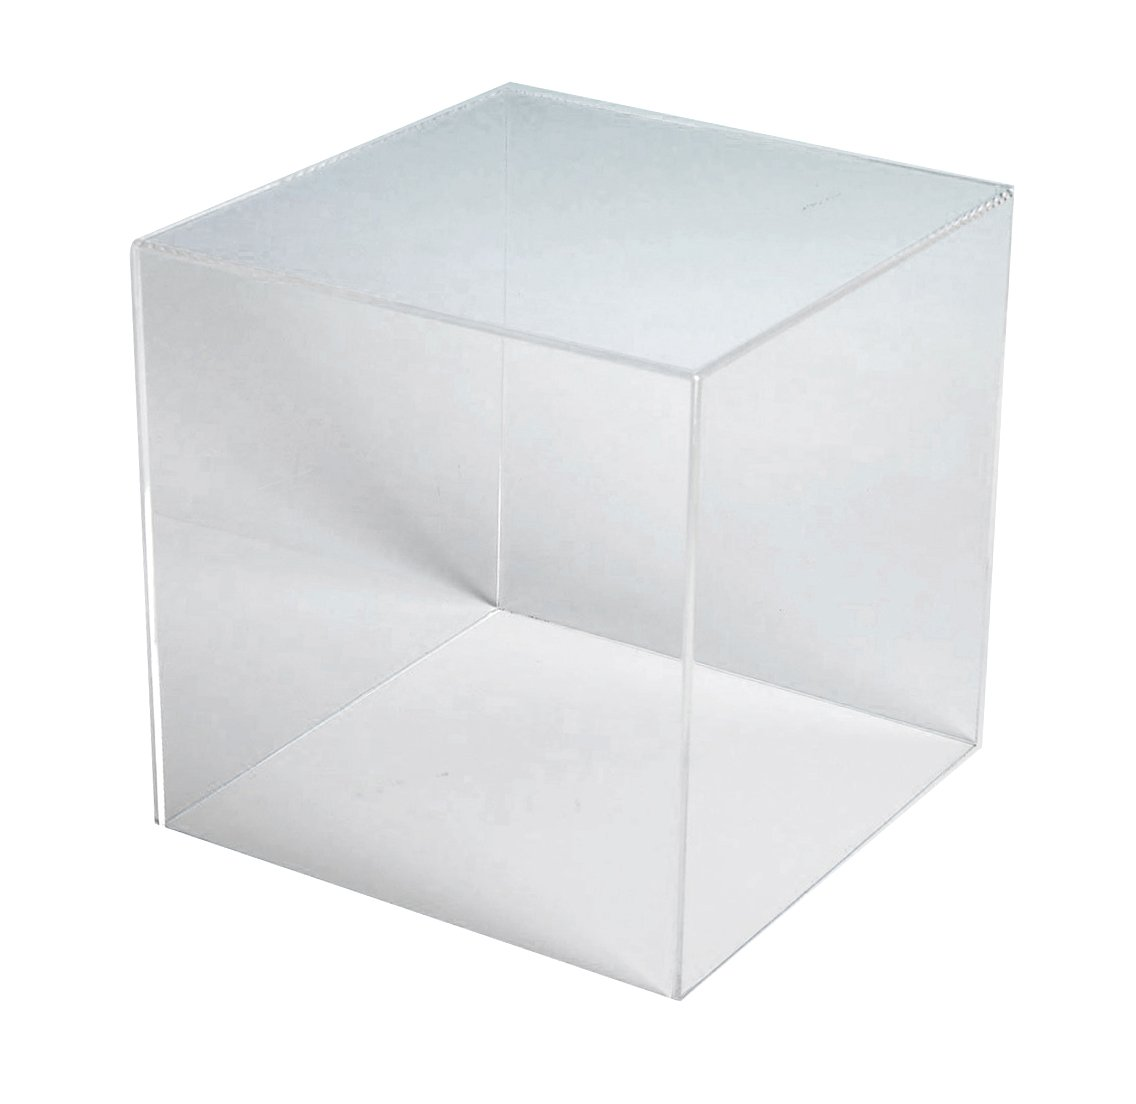 ef2d13f0f968 Choice Acrylic Displays Acrylic Box Case | 5 Sided Display Box | Acrylic  Cube 6